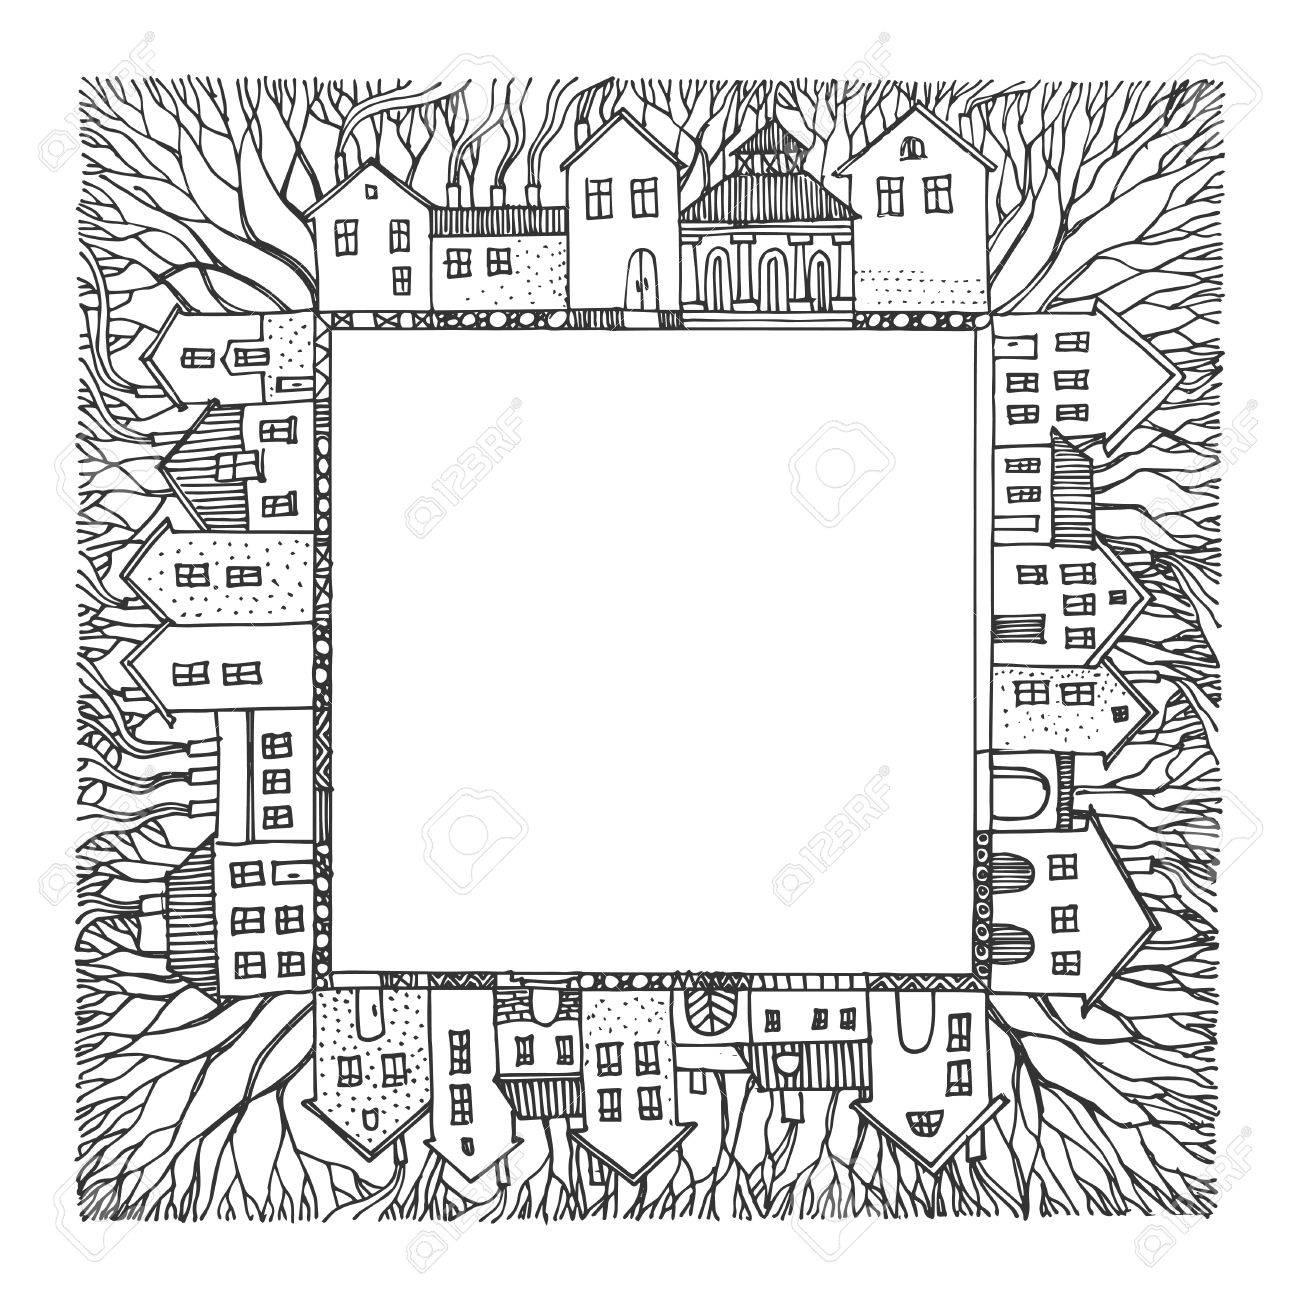 cartoon hand drawing houses frame royalty free cliparts vectors